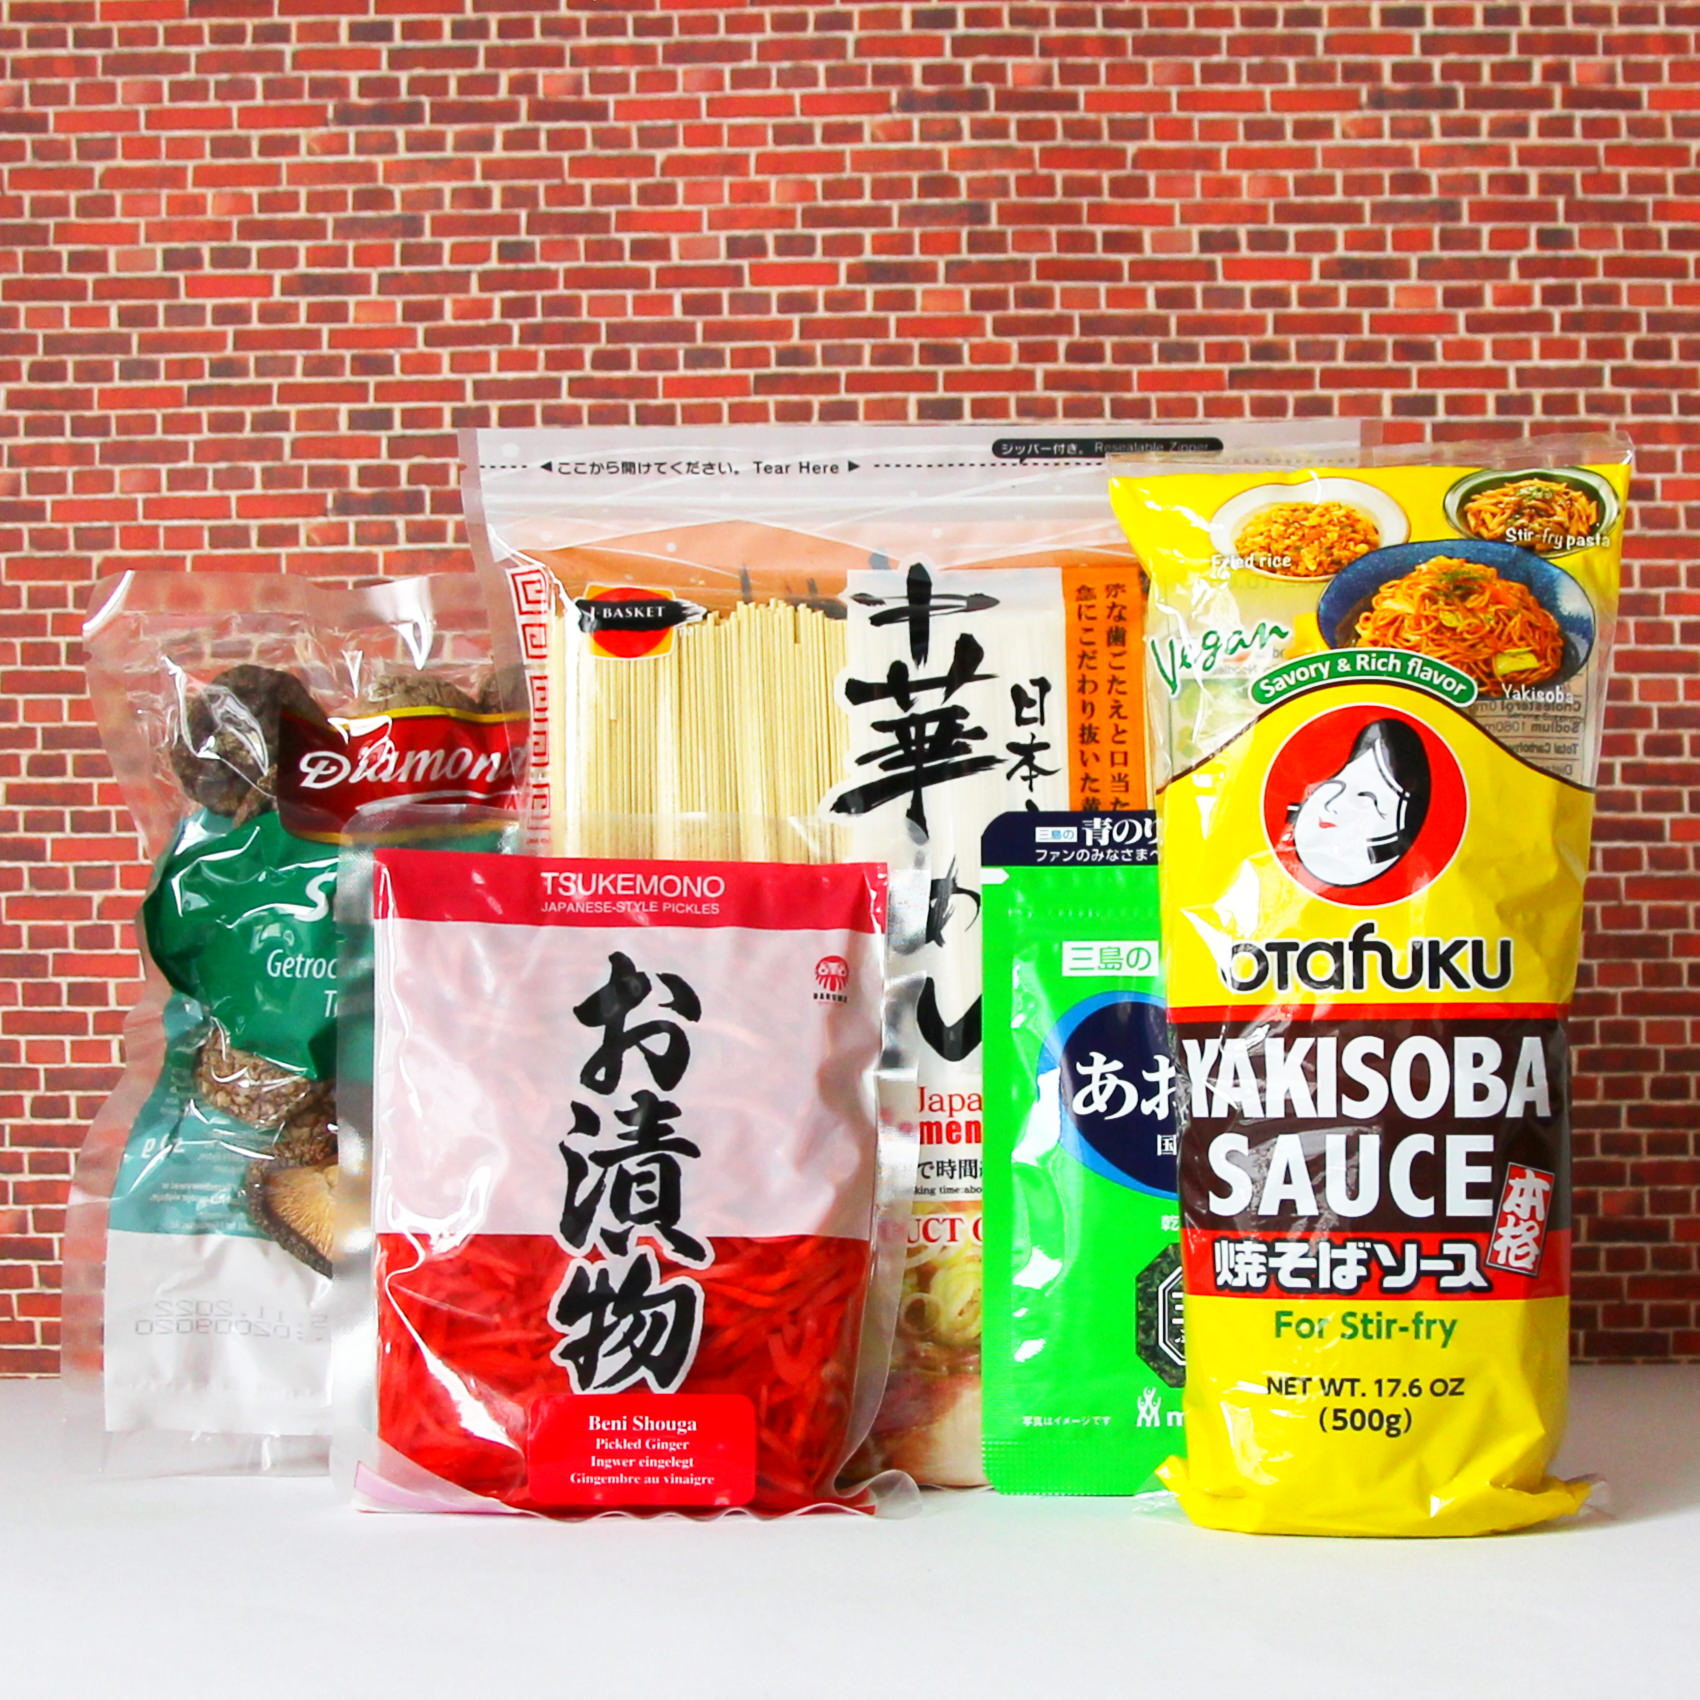 Kochset für Yakisoba.